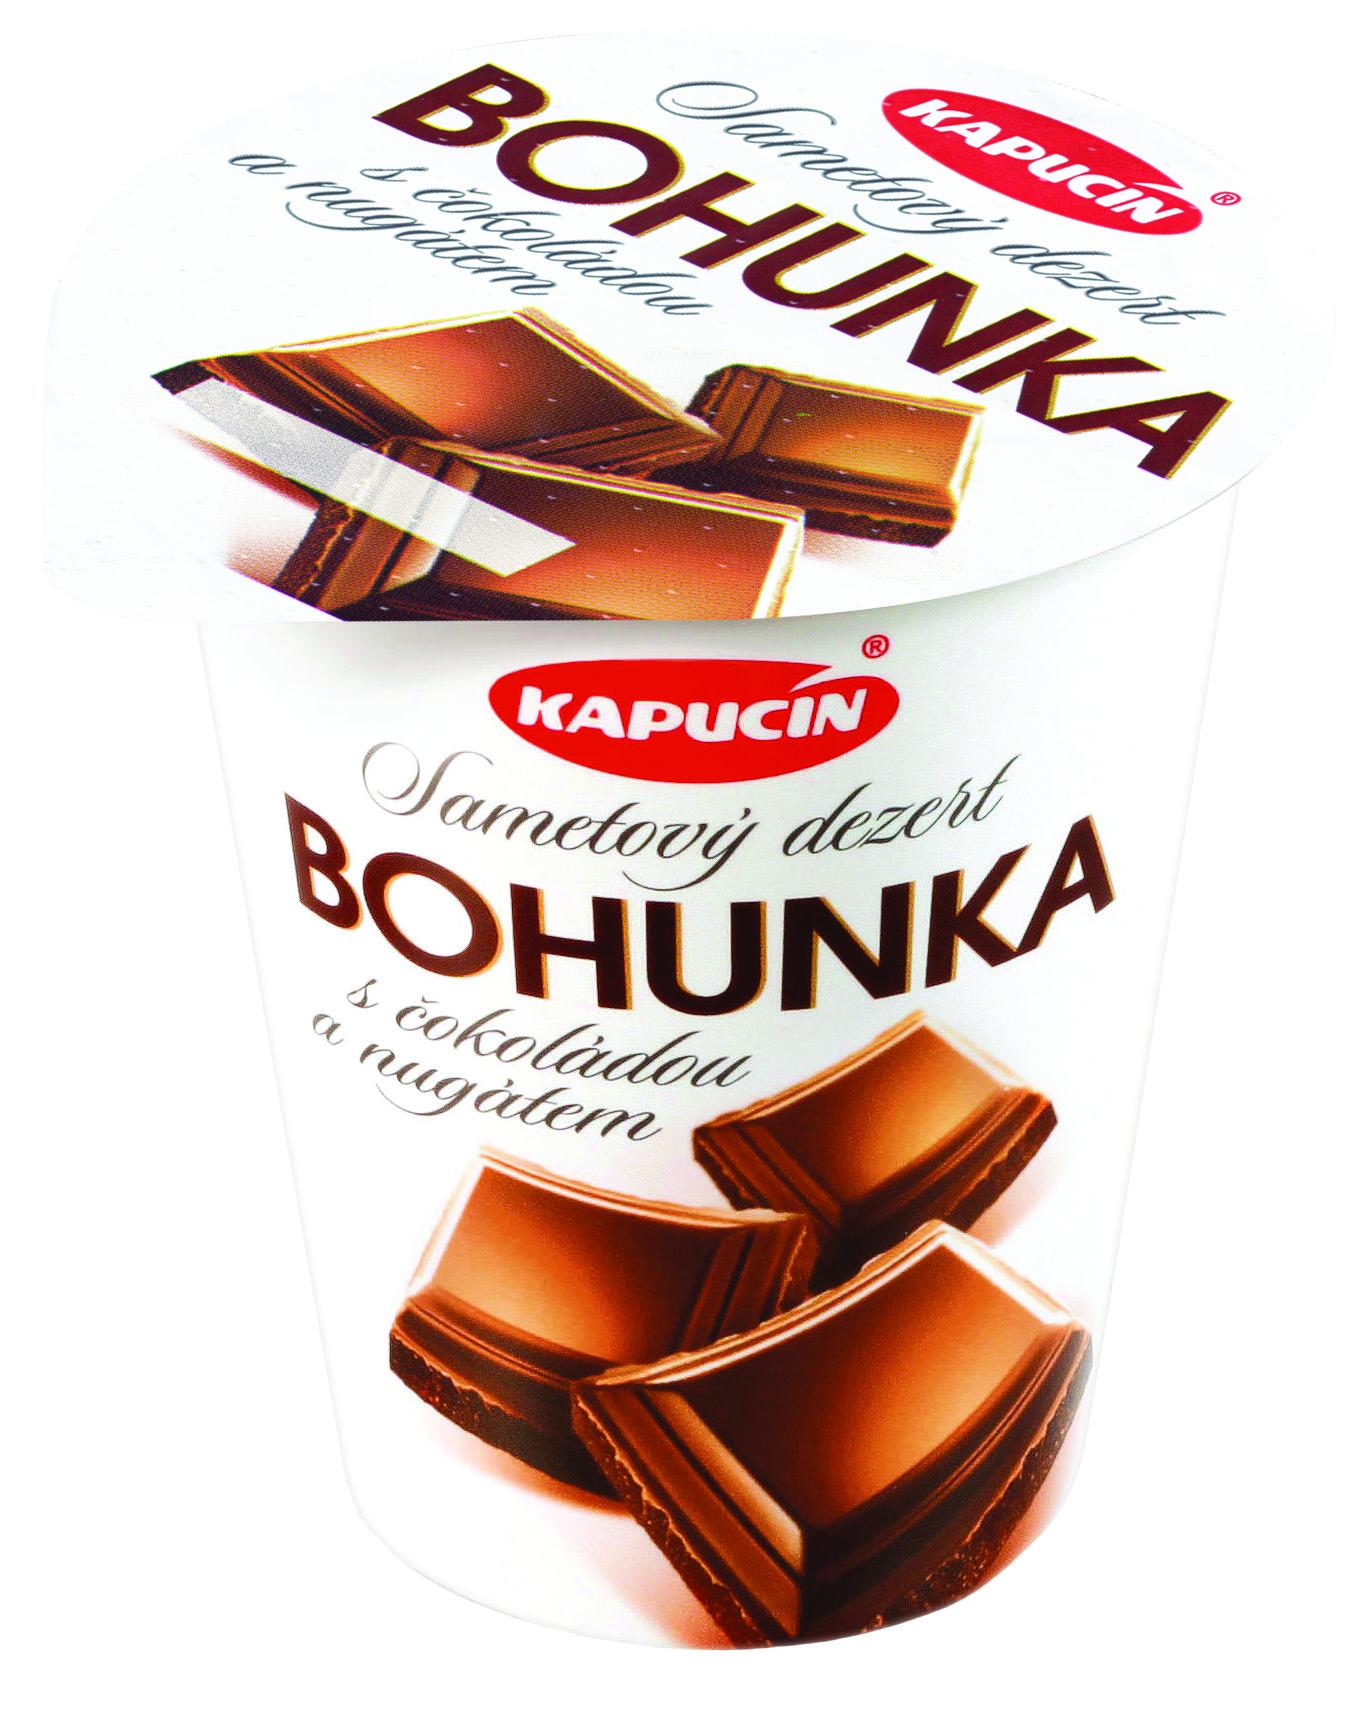 Značka Bohunka s čokoládou a nugátem 130g